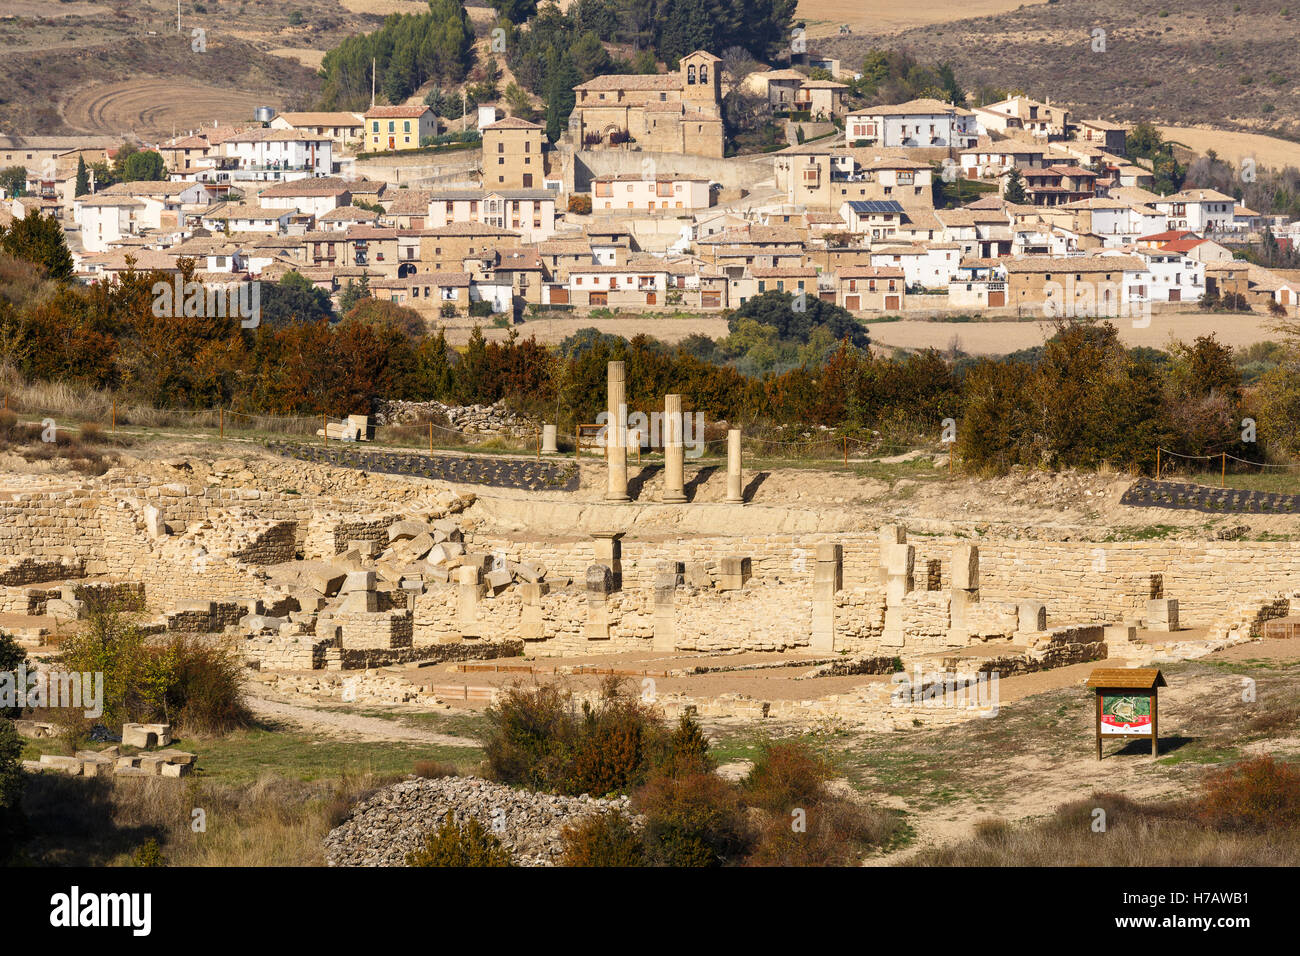 Santa Criz roman city ruins and Eslava village. Navarre province. Spain Stock Photo